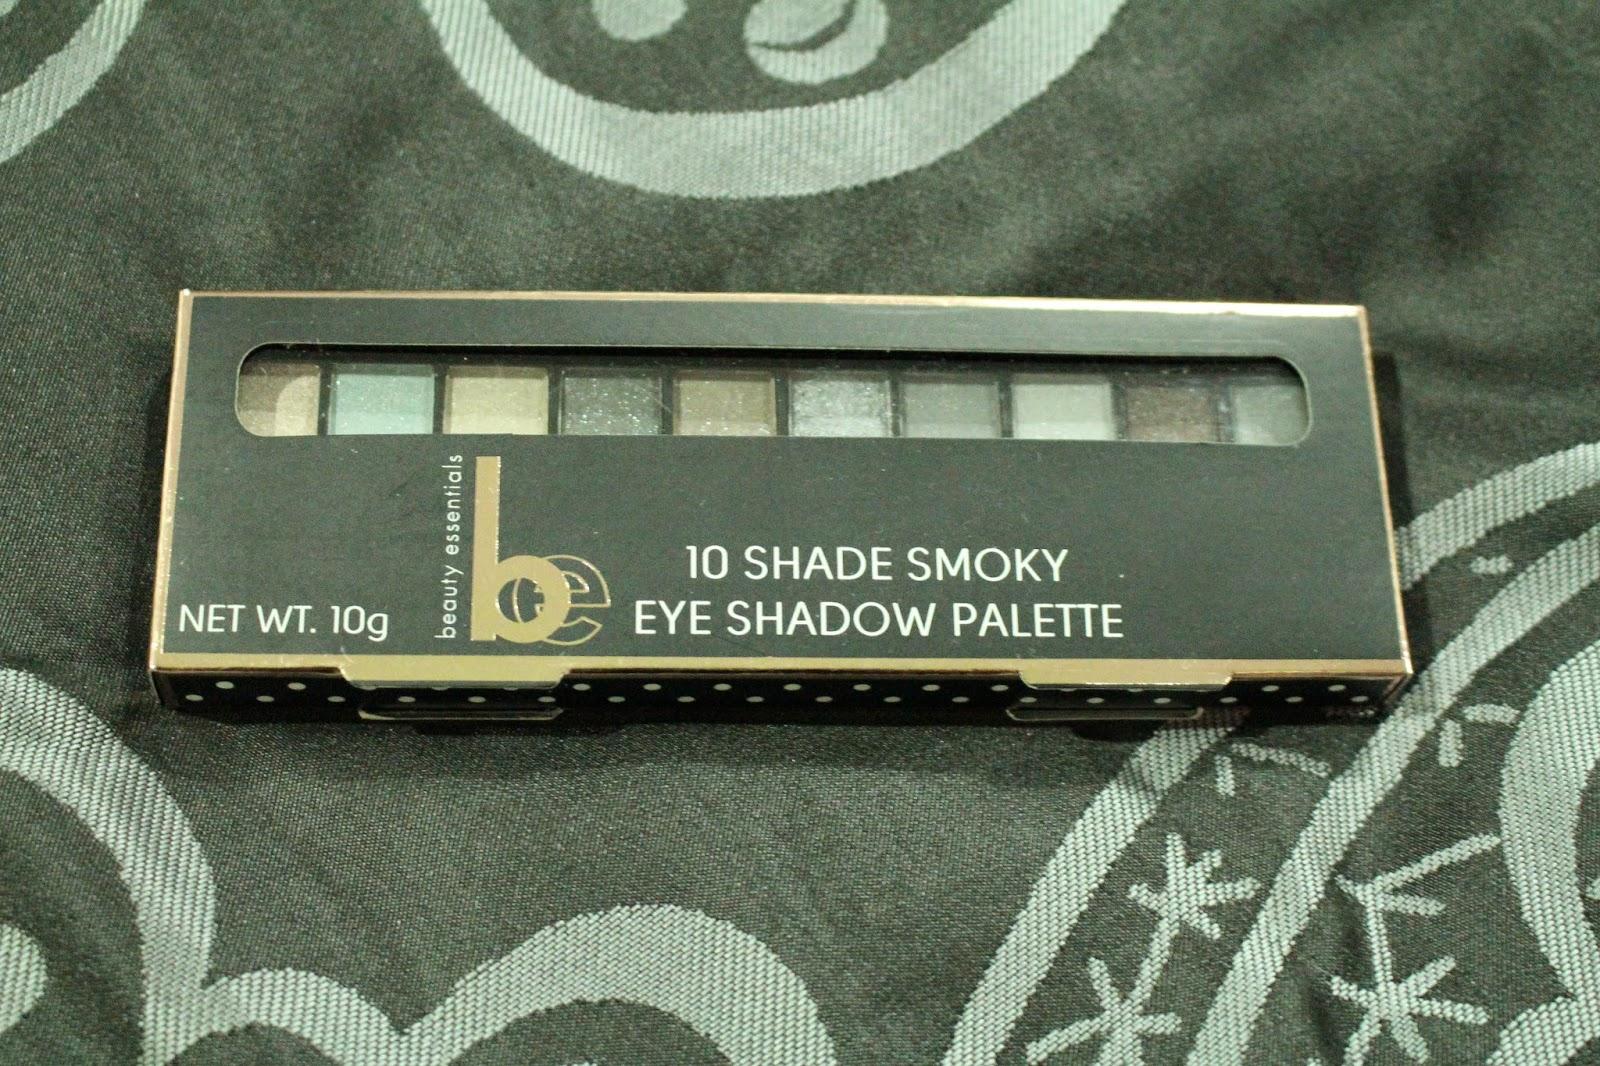 Beauty Essentials 10 Shade Smoky Eye Shadow Palette